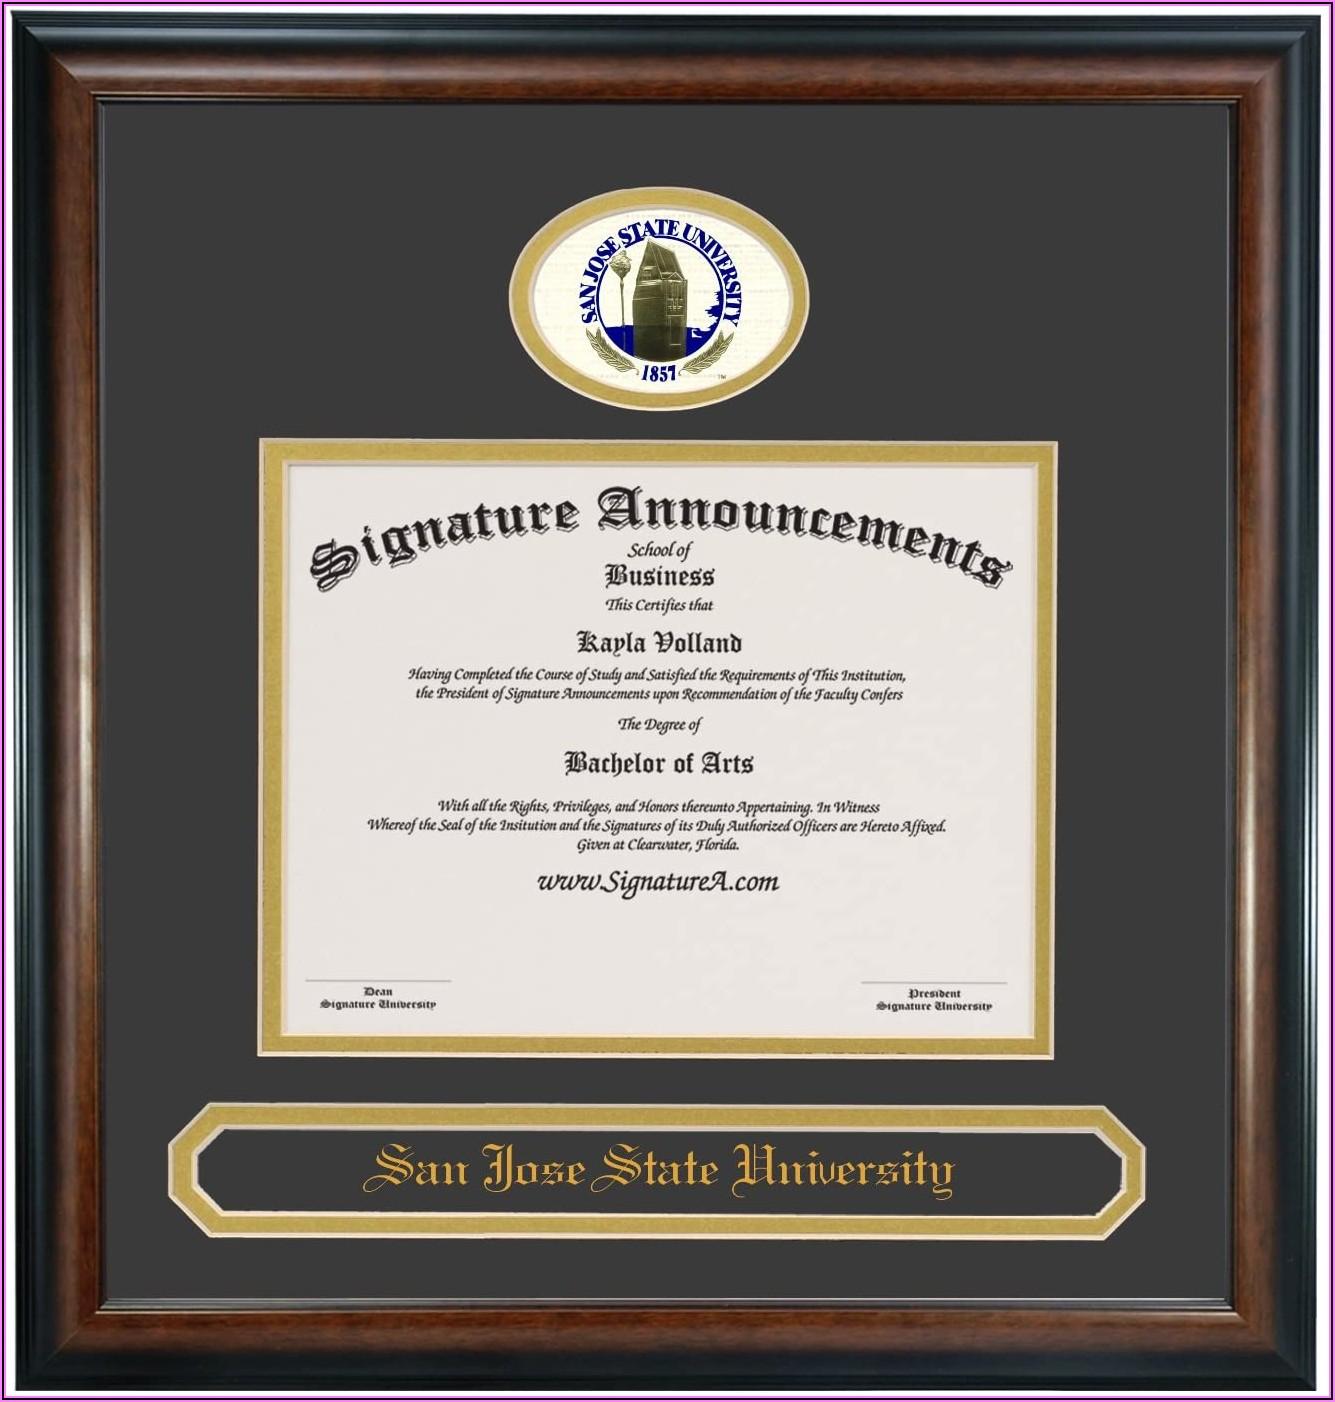 San Jose State University Graduation Announcements